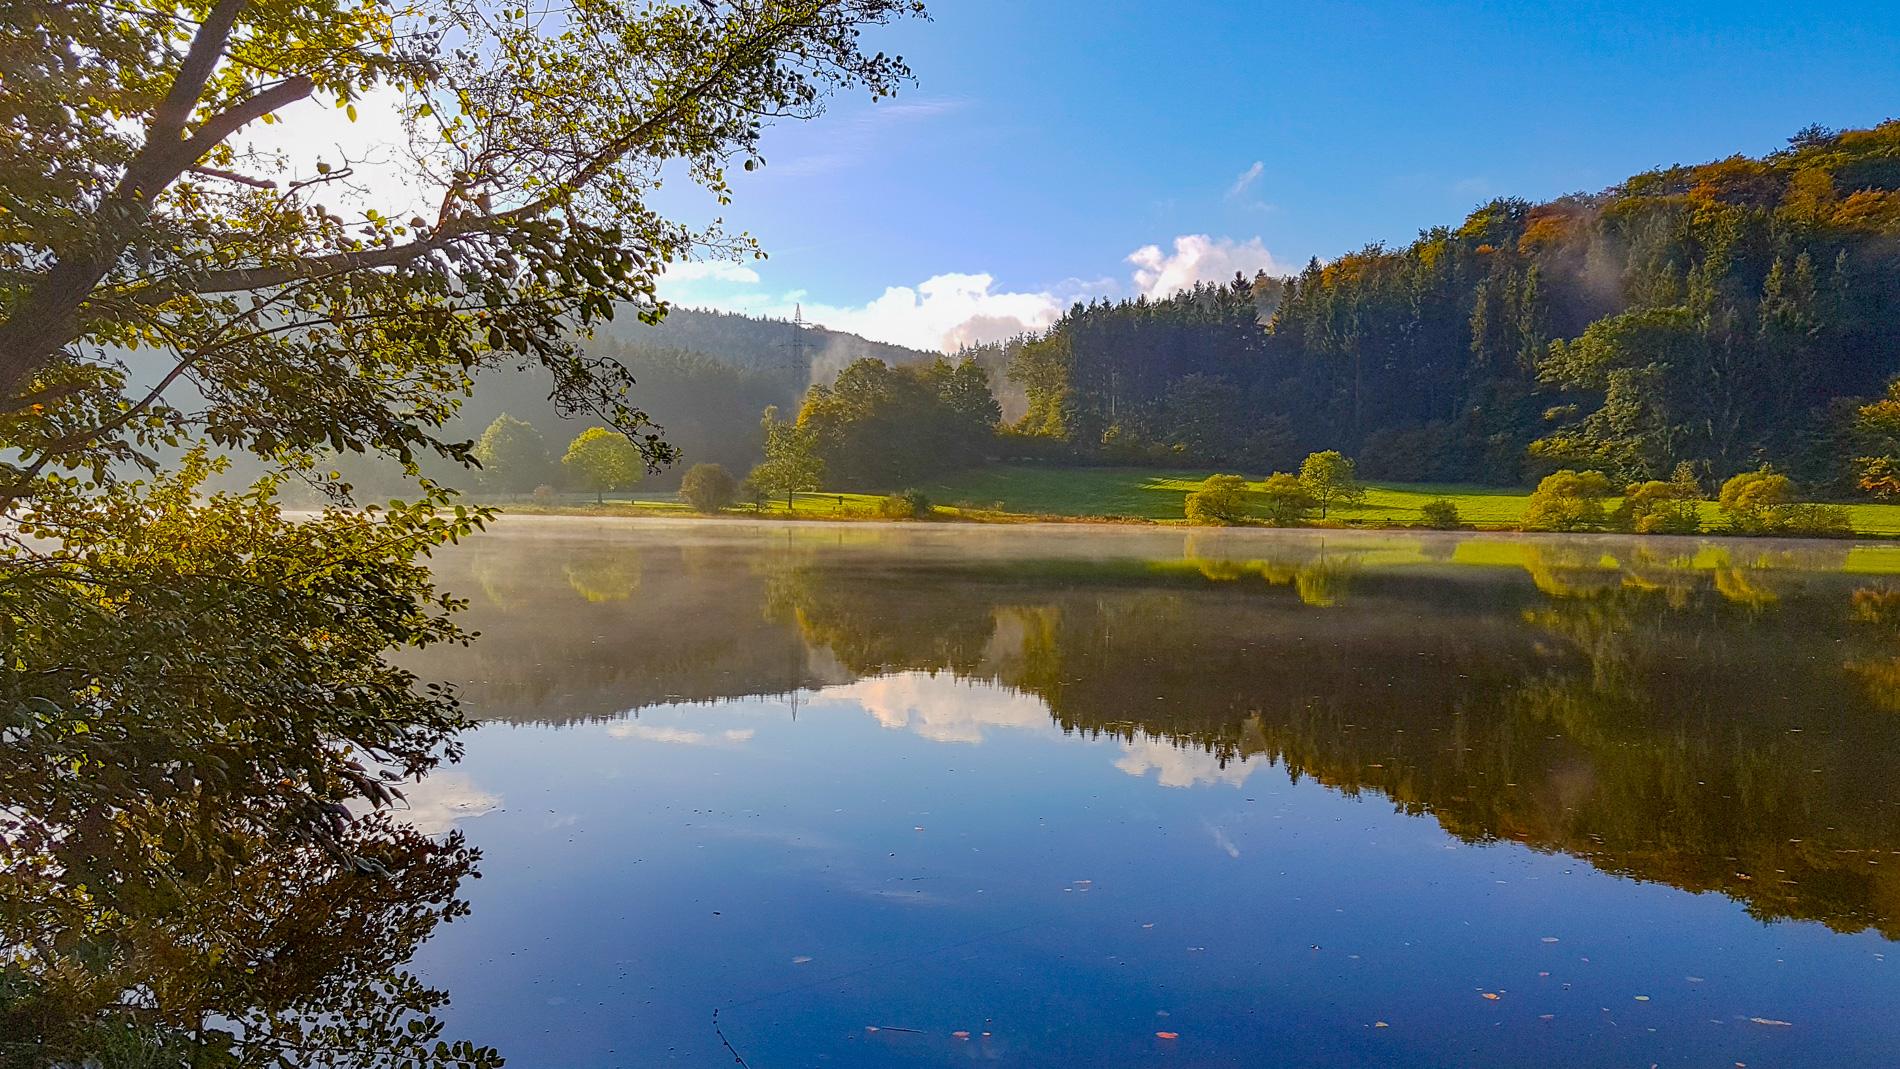 Marbach Stausee im Sommer